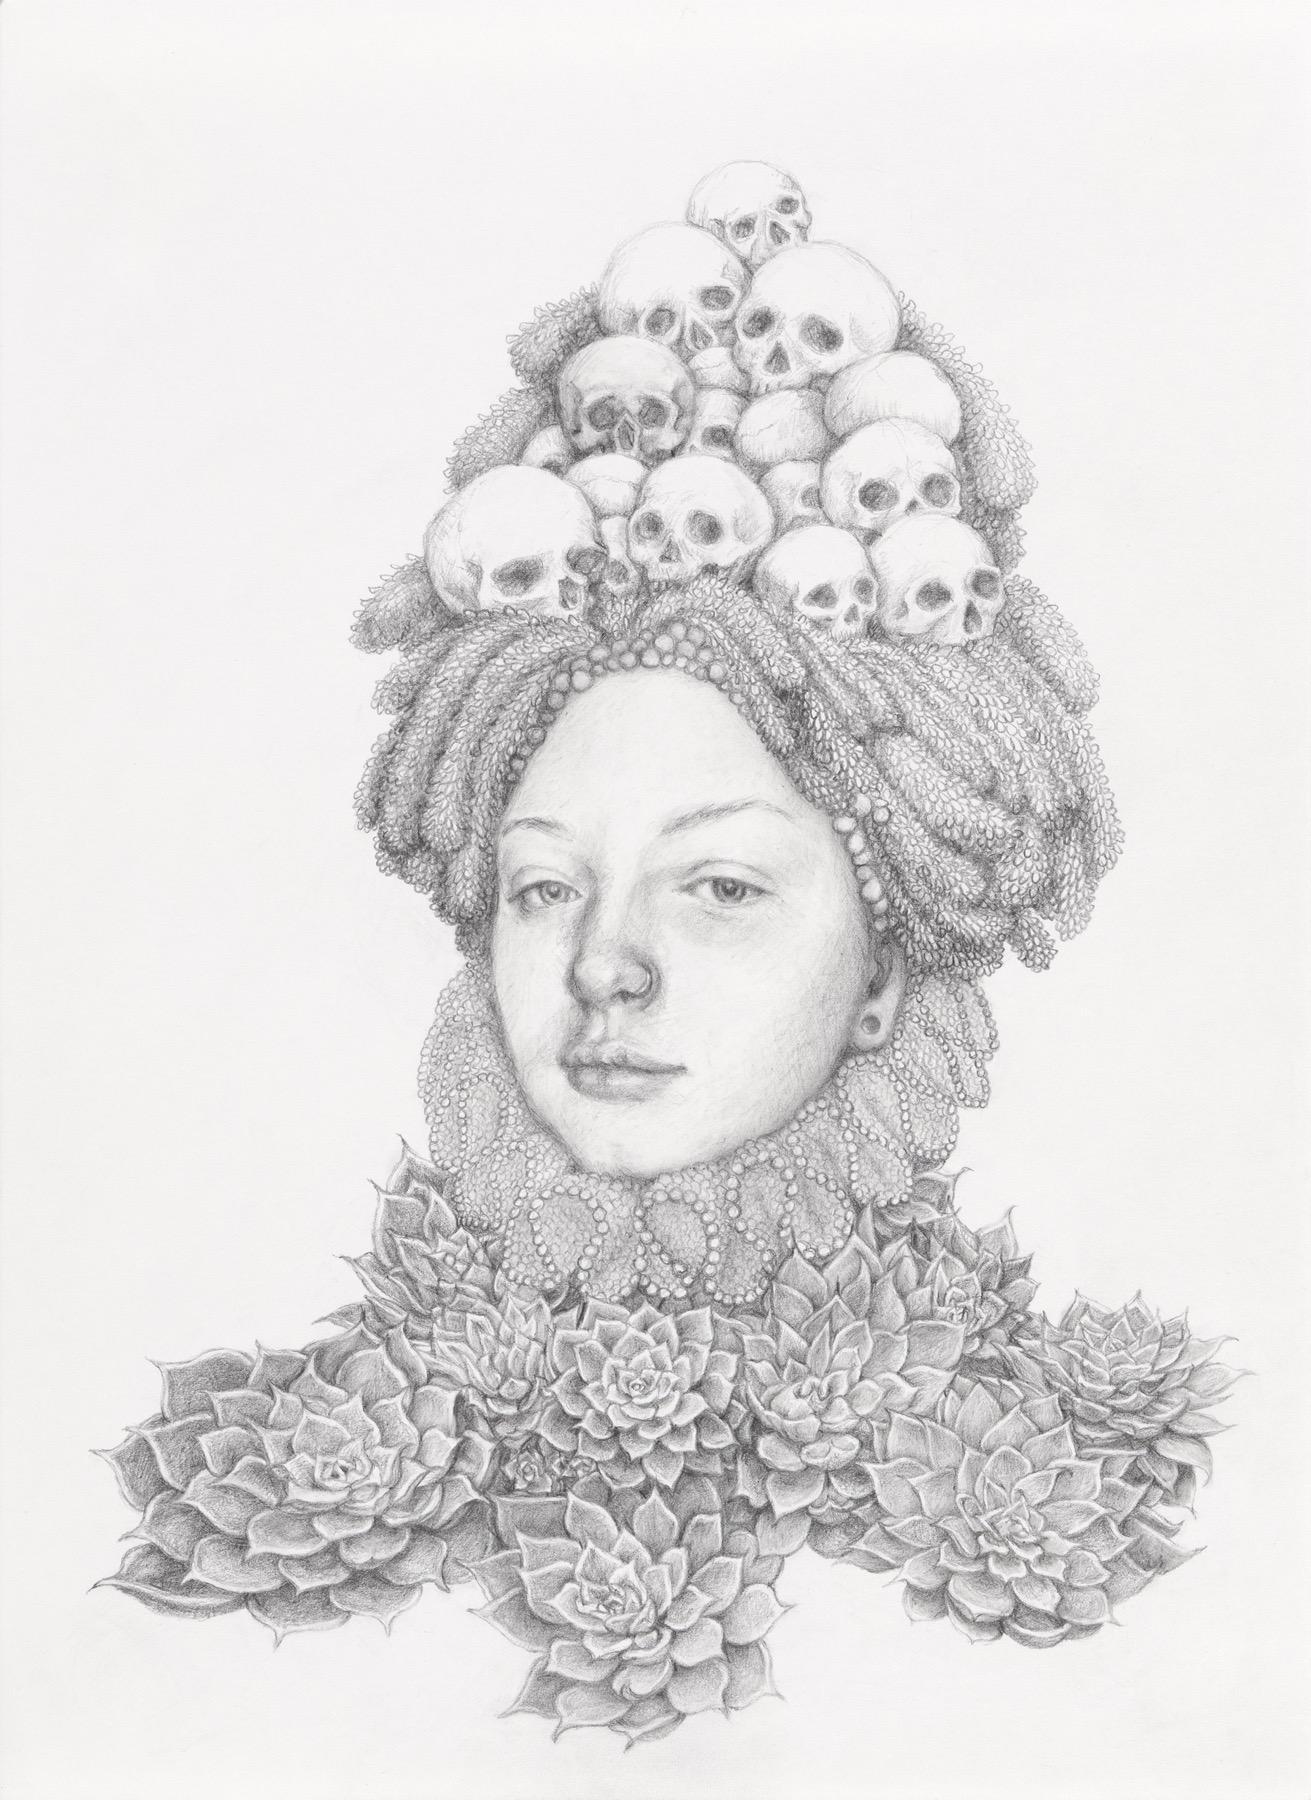 Infanta Suculentas,- graphite pencil drawing - woman with skulls & succulents